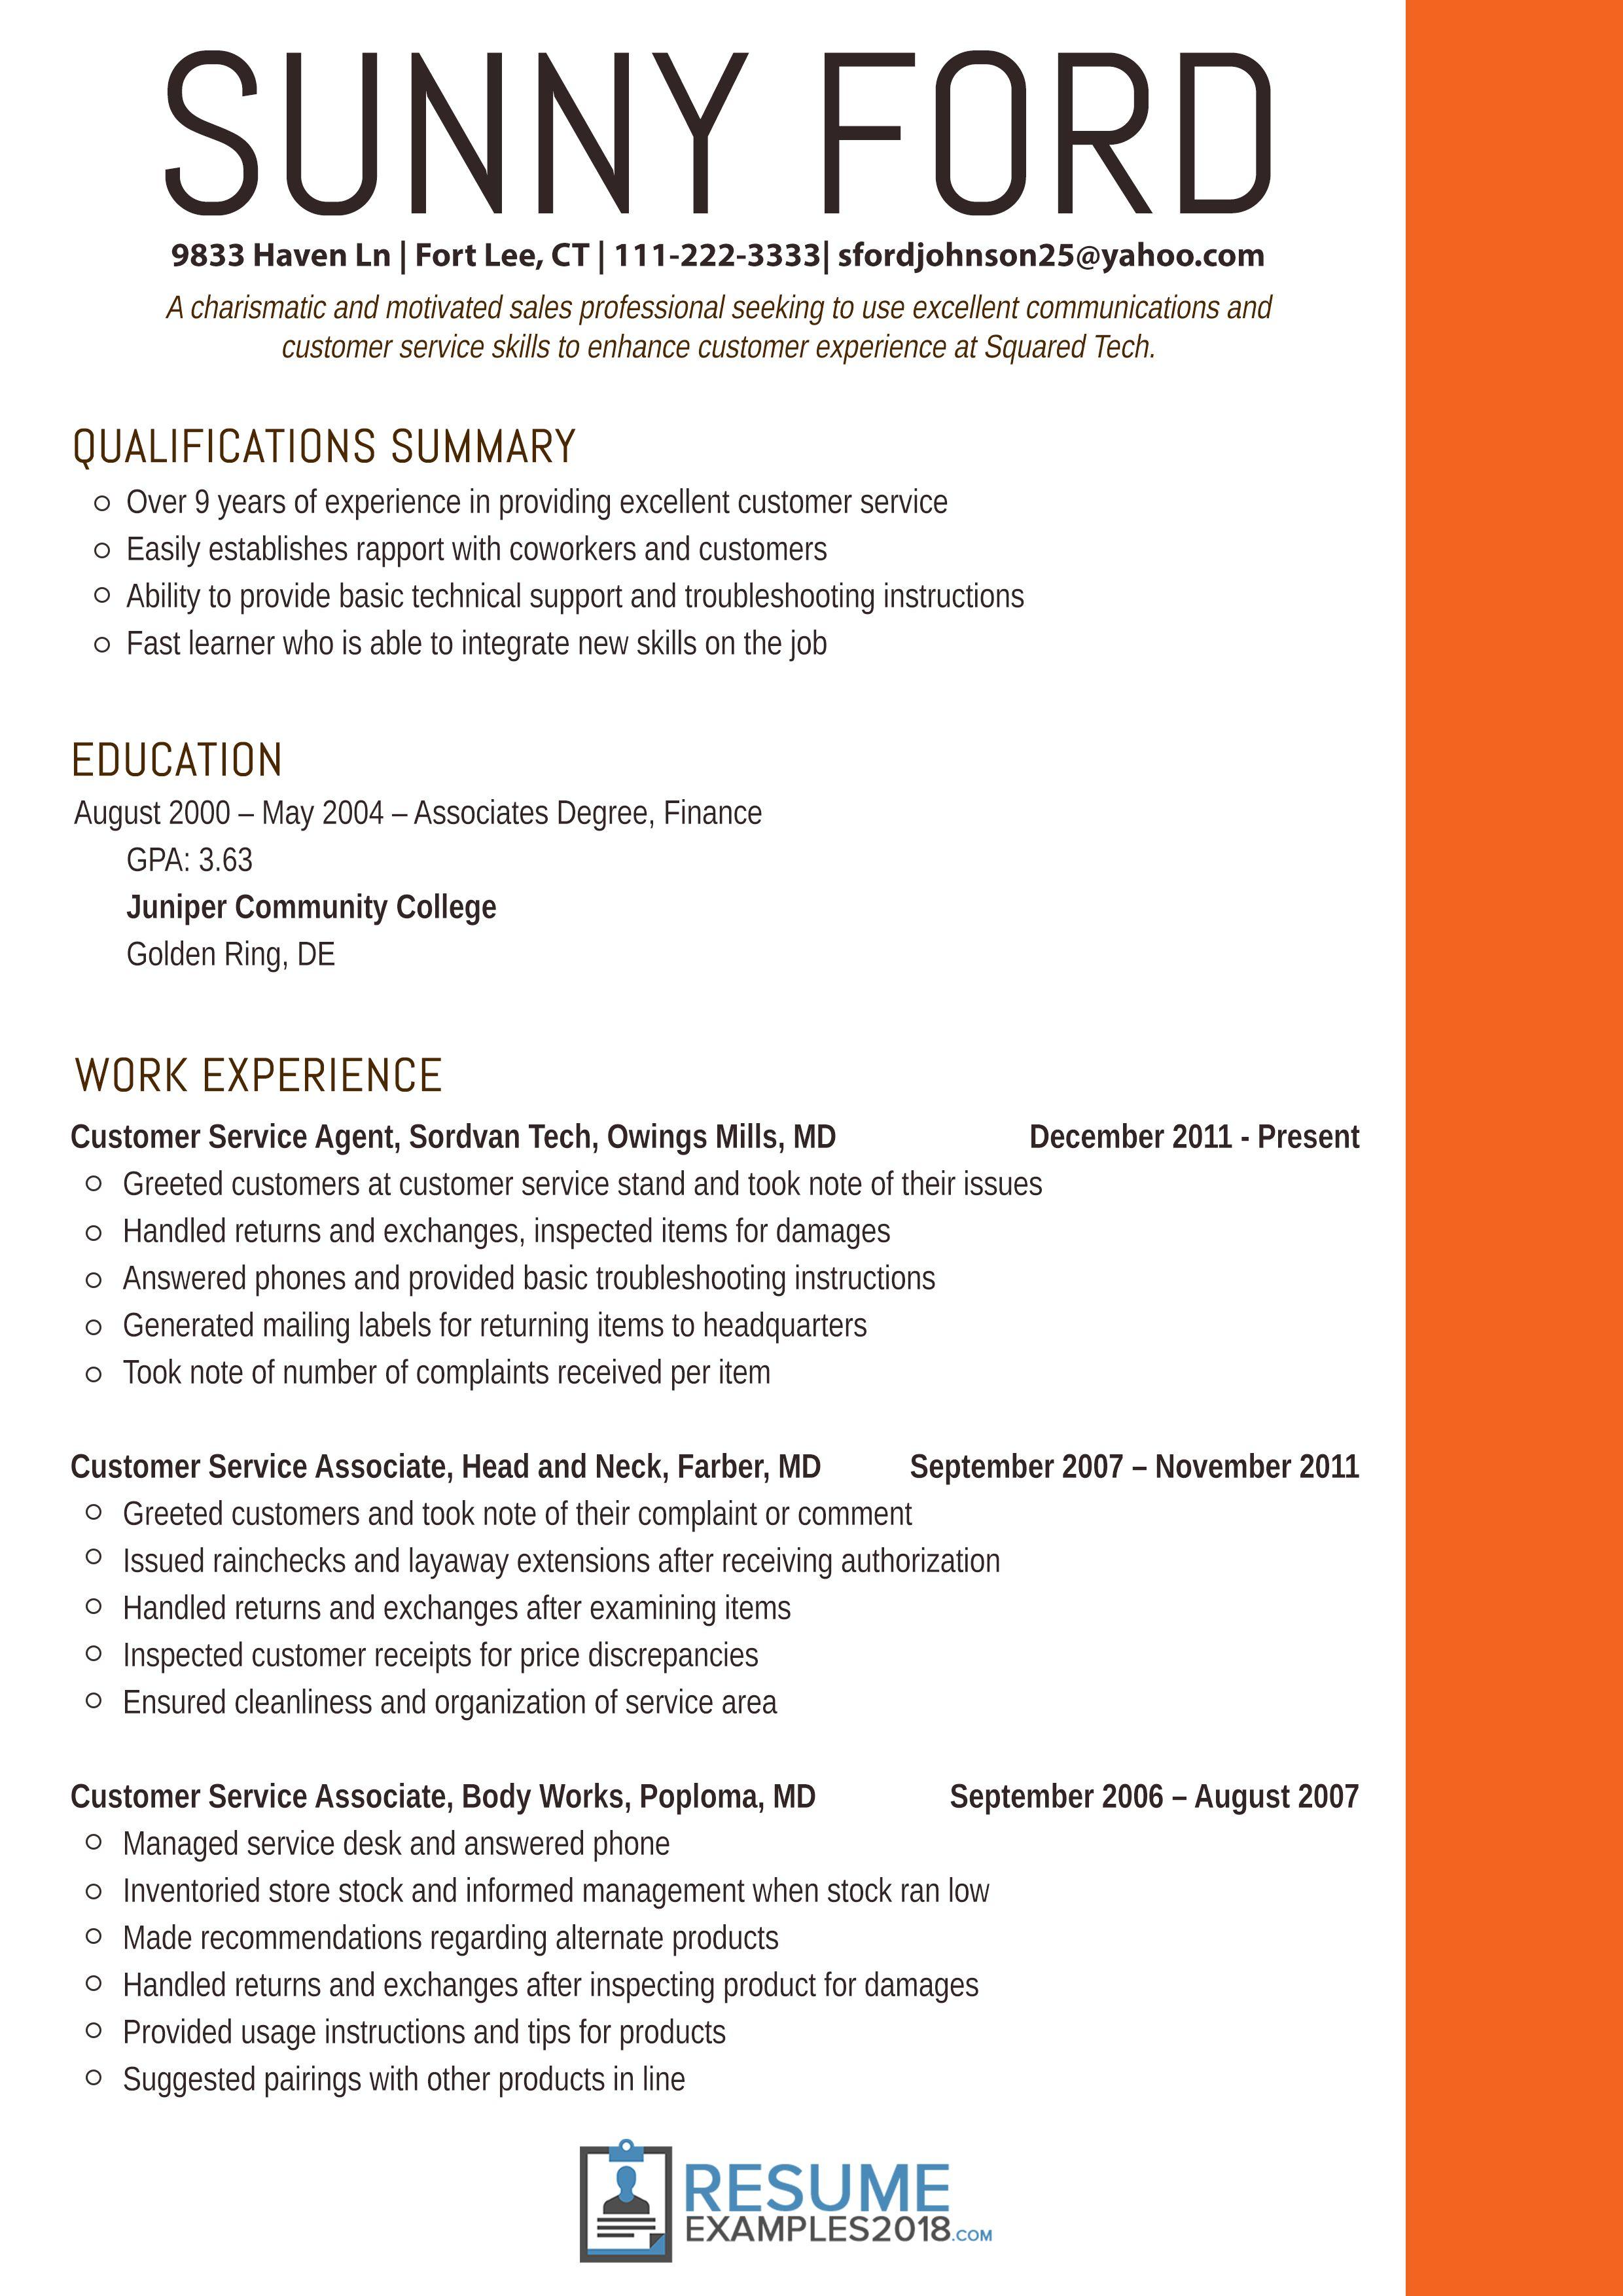 Resume Examples 2018 Finance Examples Finance Resume